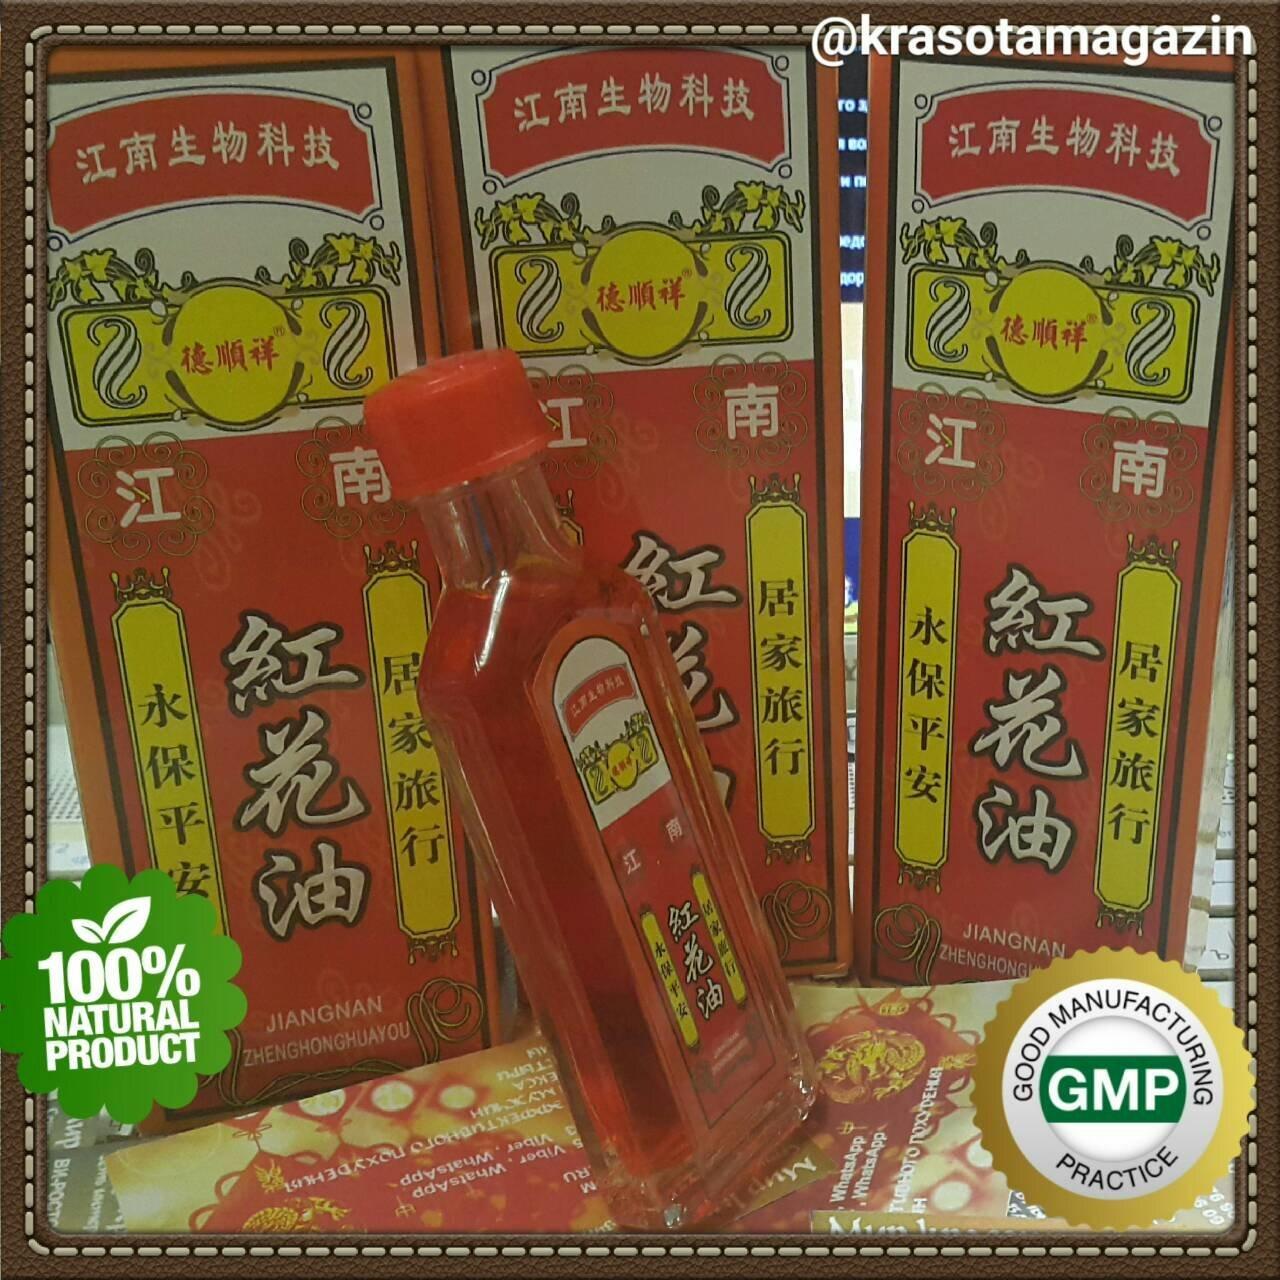 Zhenghonghua You Oil Каменное масло. Красный цветок. Бальзам обезболивающий 25ml - фото pic_03e6a453833f47a_1920x9000_1.jpg